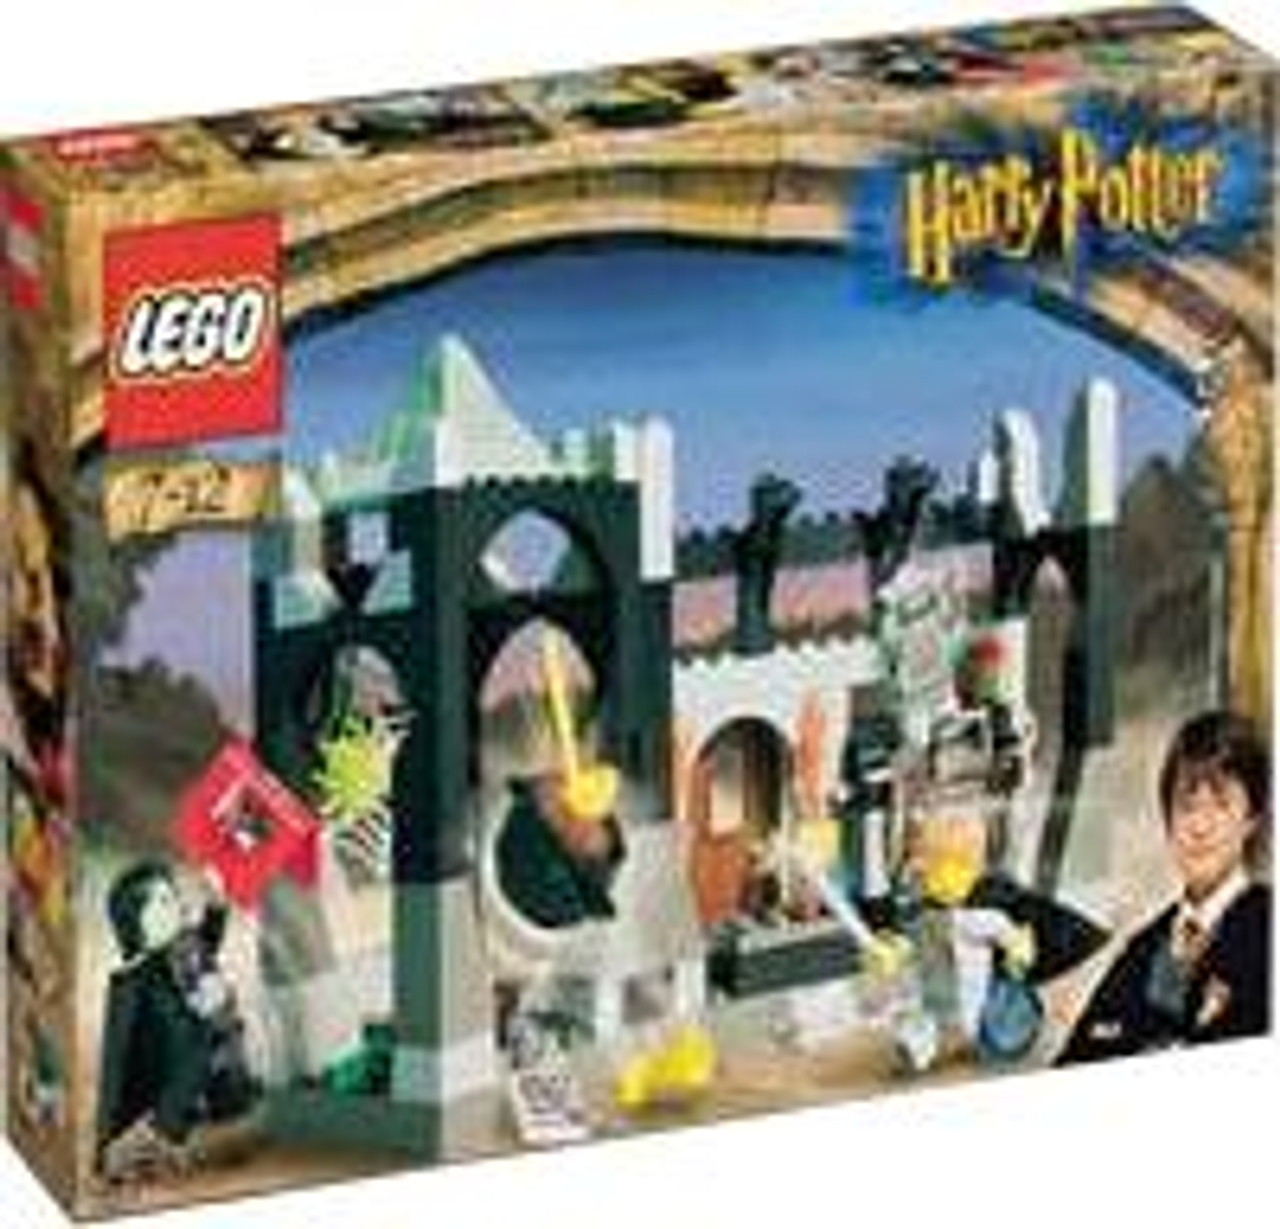 LEGO Harry Potter Series 1 Sorcerer's Stone Snape's Classroom Set #4705